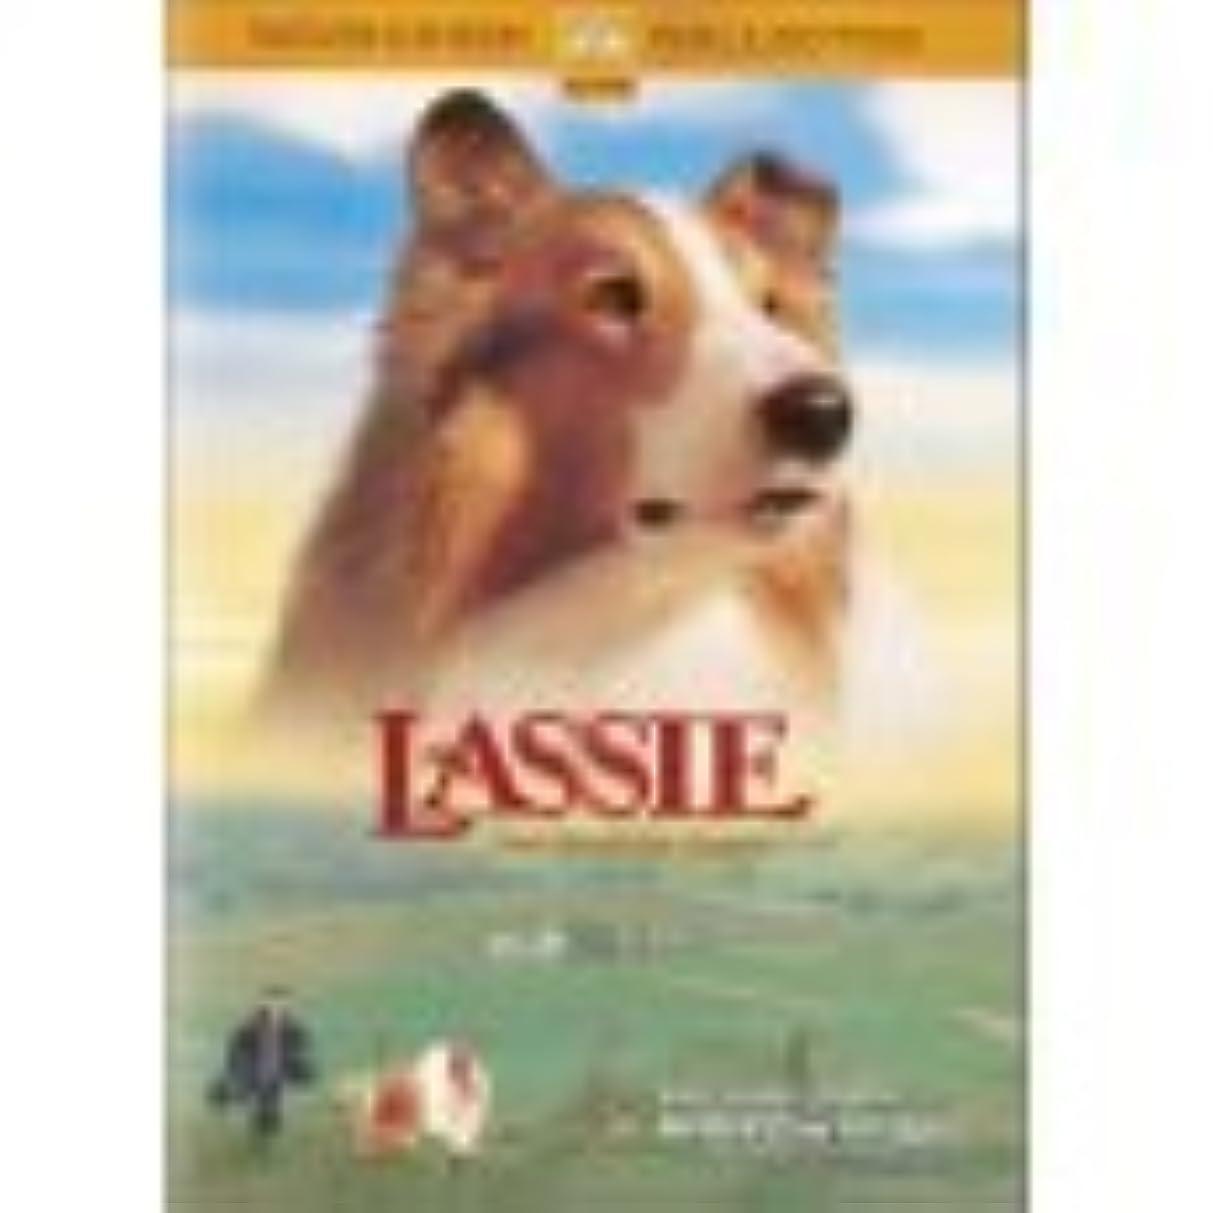 Lassie-Dvd